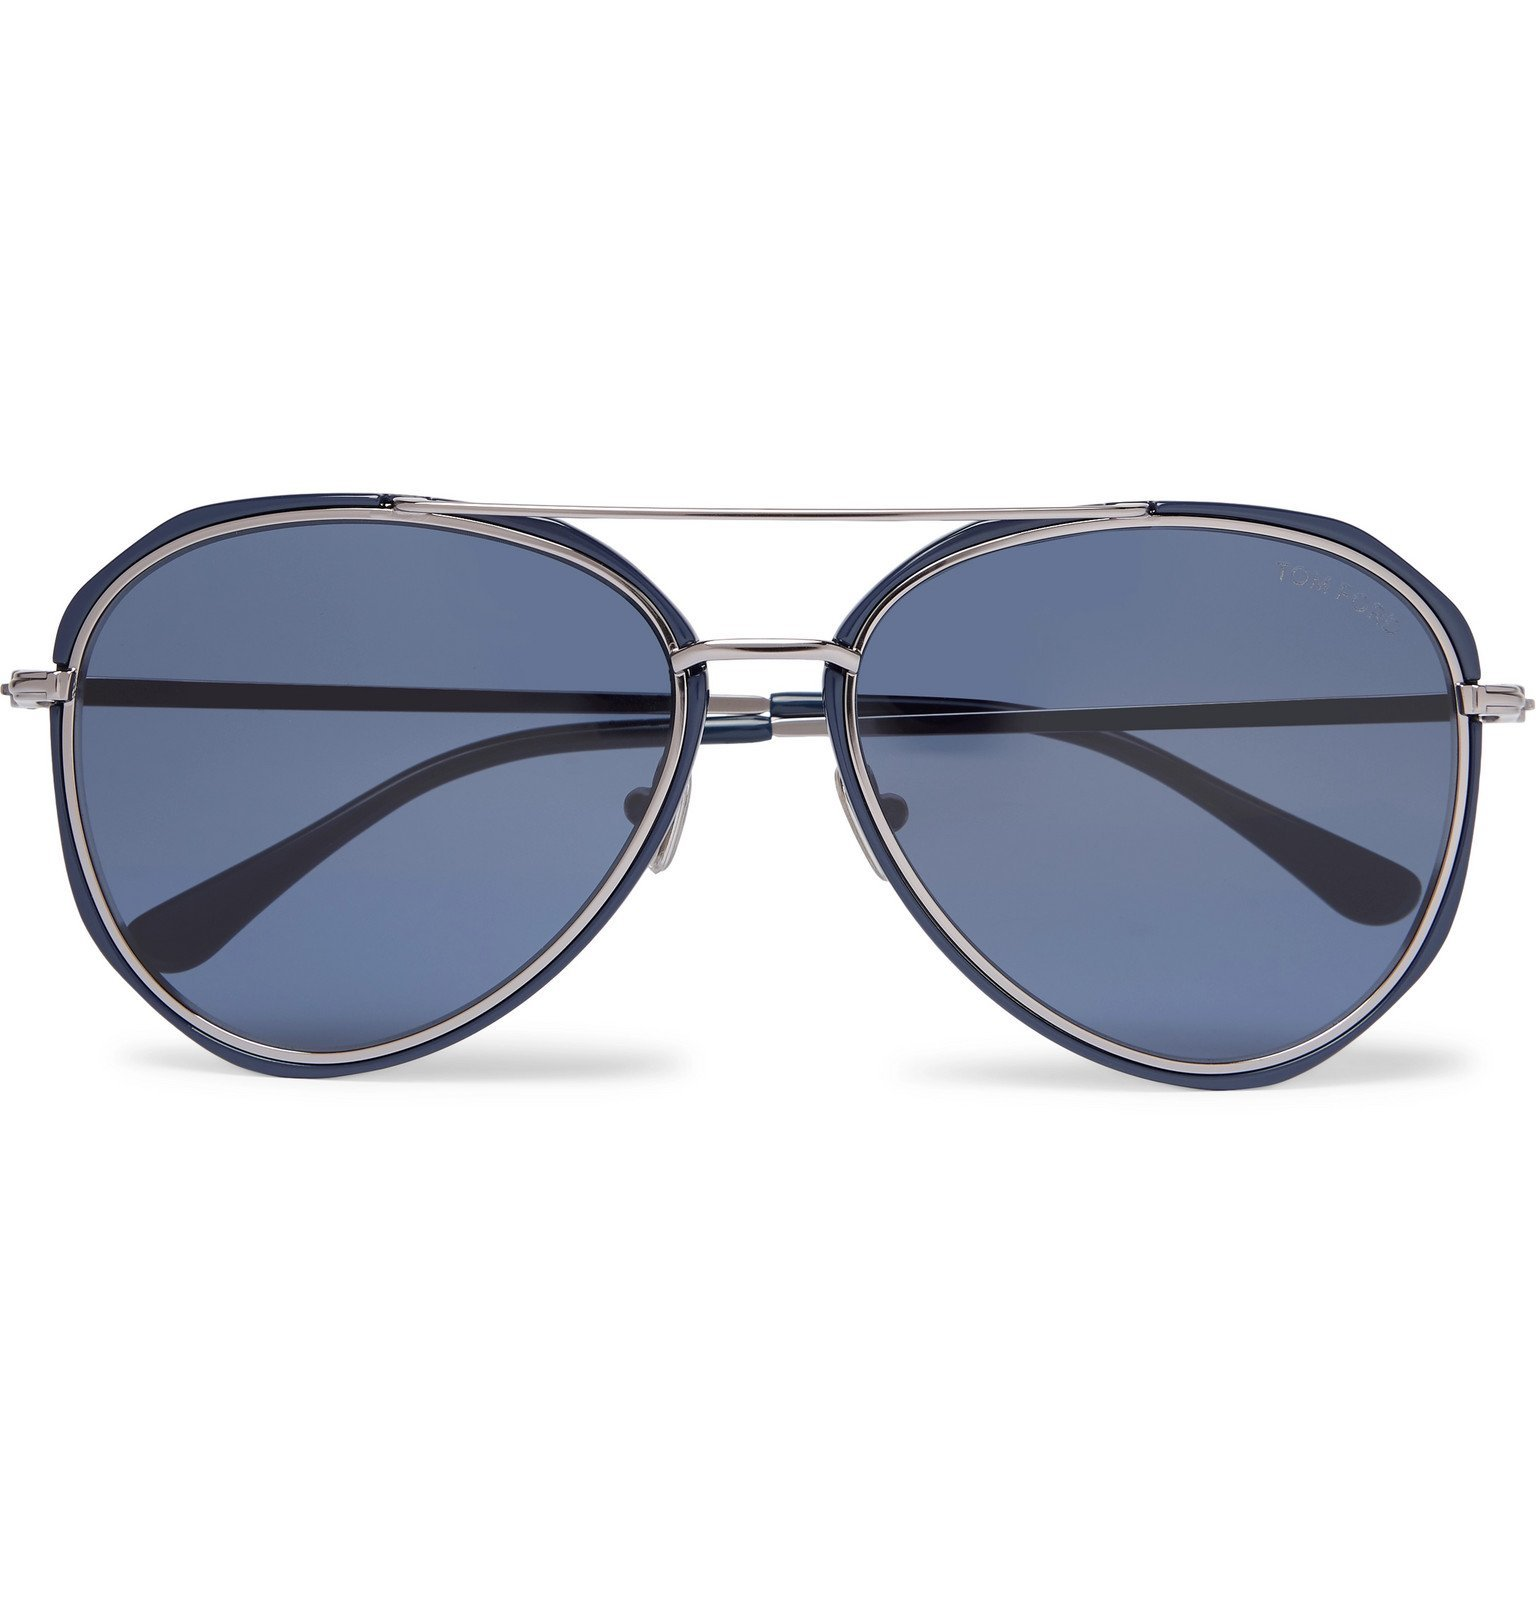 Photo: TOM FORD - Aviator-Style Acetate and Silver-Tone Sunglasses - Blue